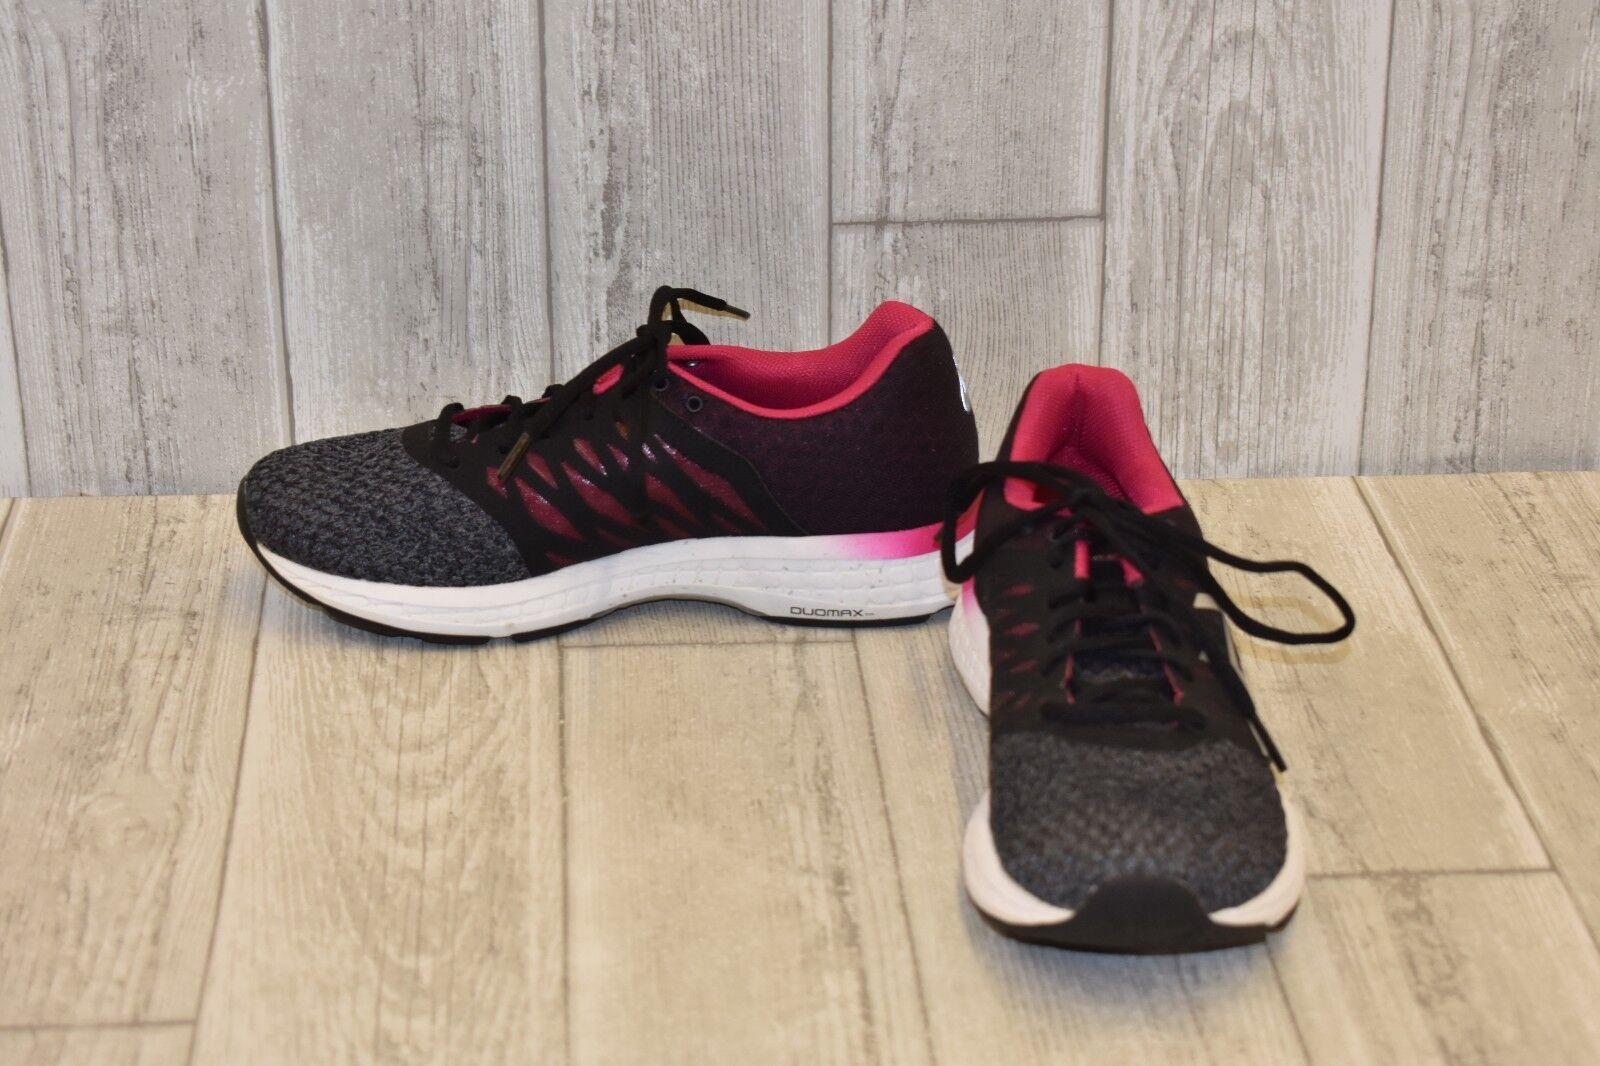 Asics Gel Exhalt 4 Sneaker-Women's Size 8 Carbon Silver Pink